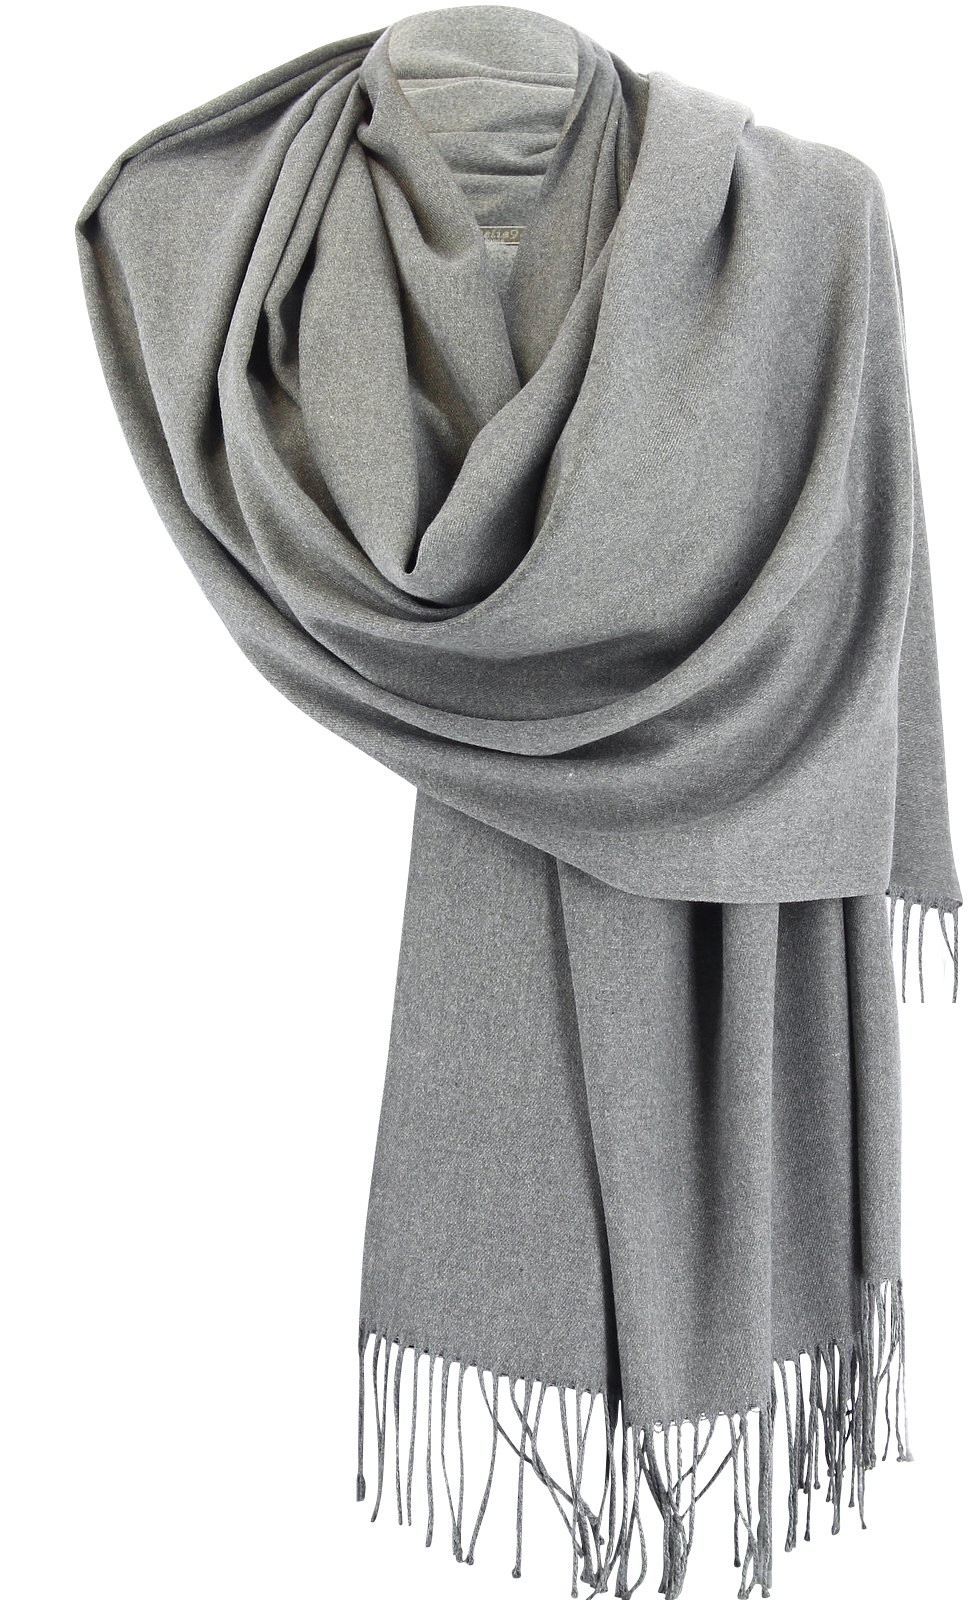 90b51a21f3e0 Echarpe chale laine echarpe carreaux femme   Arts4a